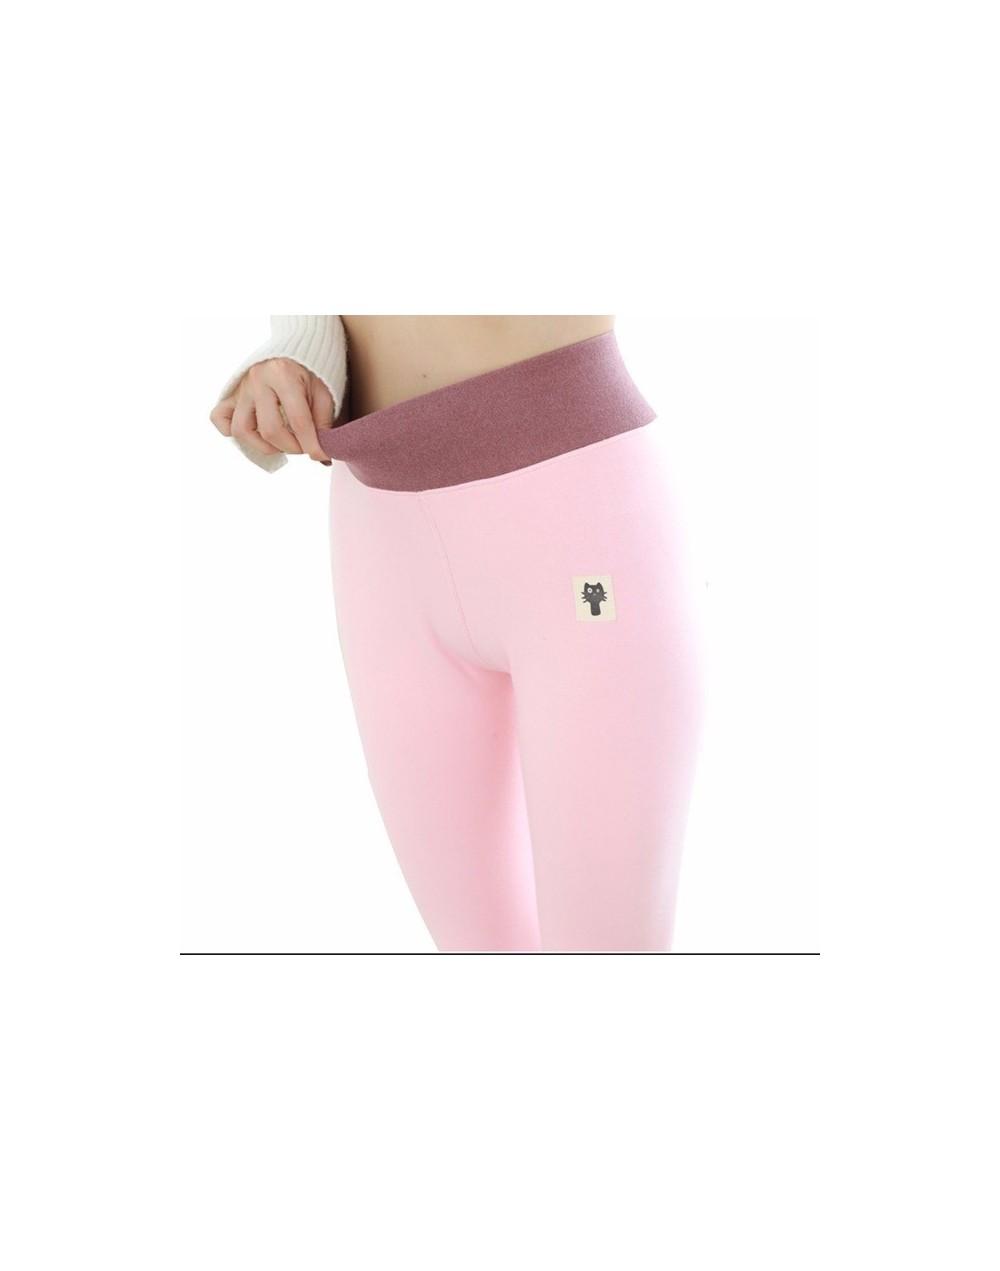 Winter Women Leggings Thick Winter Warm Pants High Waist Slimming Thicken High Elastic Women's Velvet Pants Warm Legging - p...